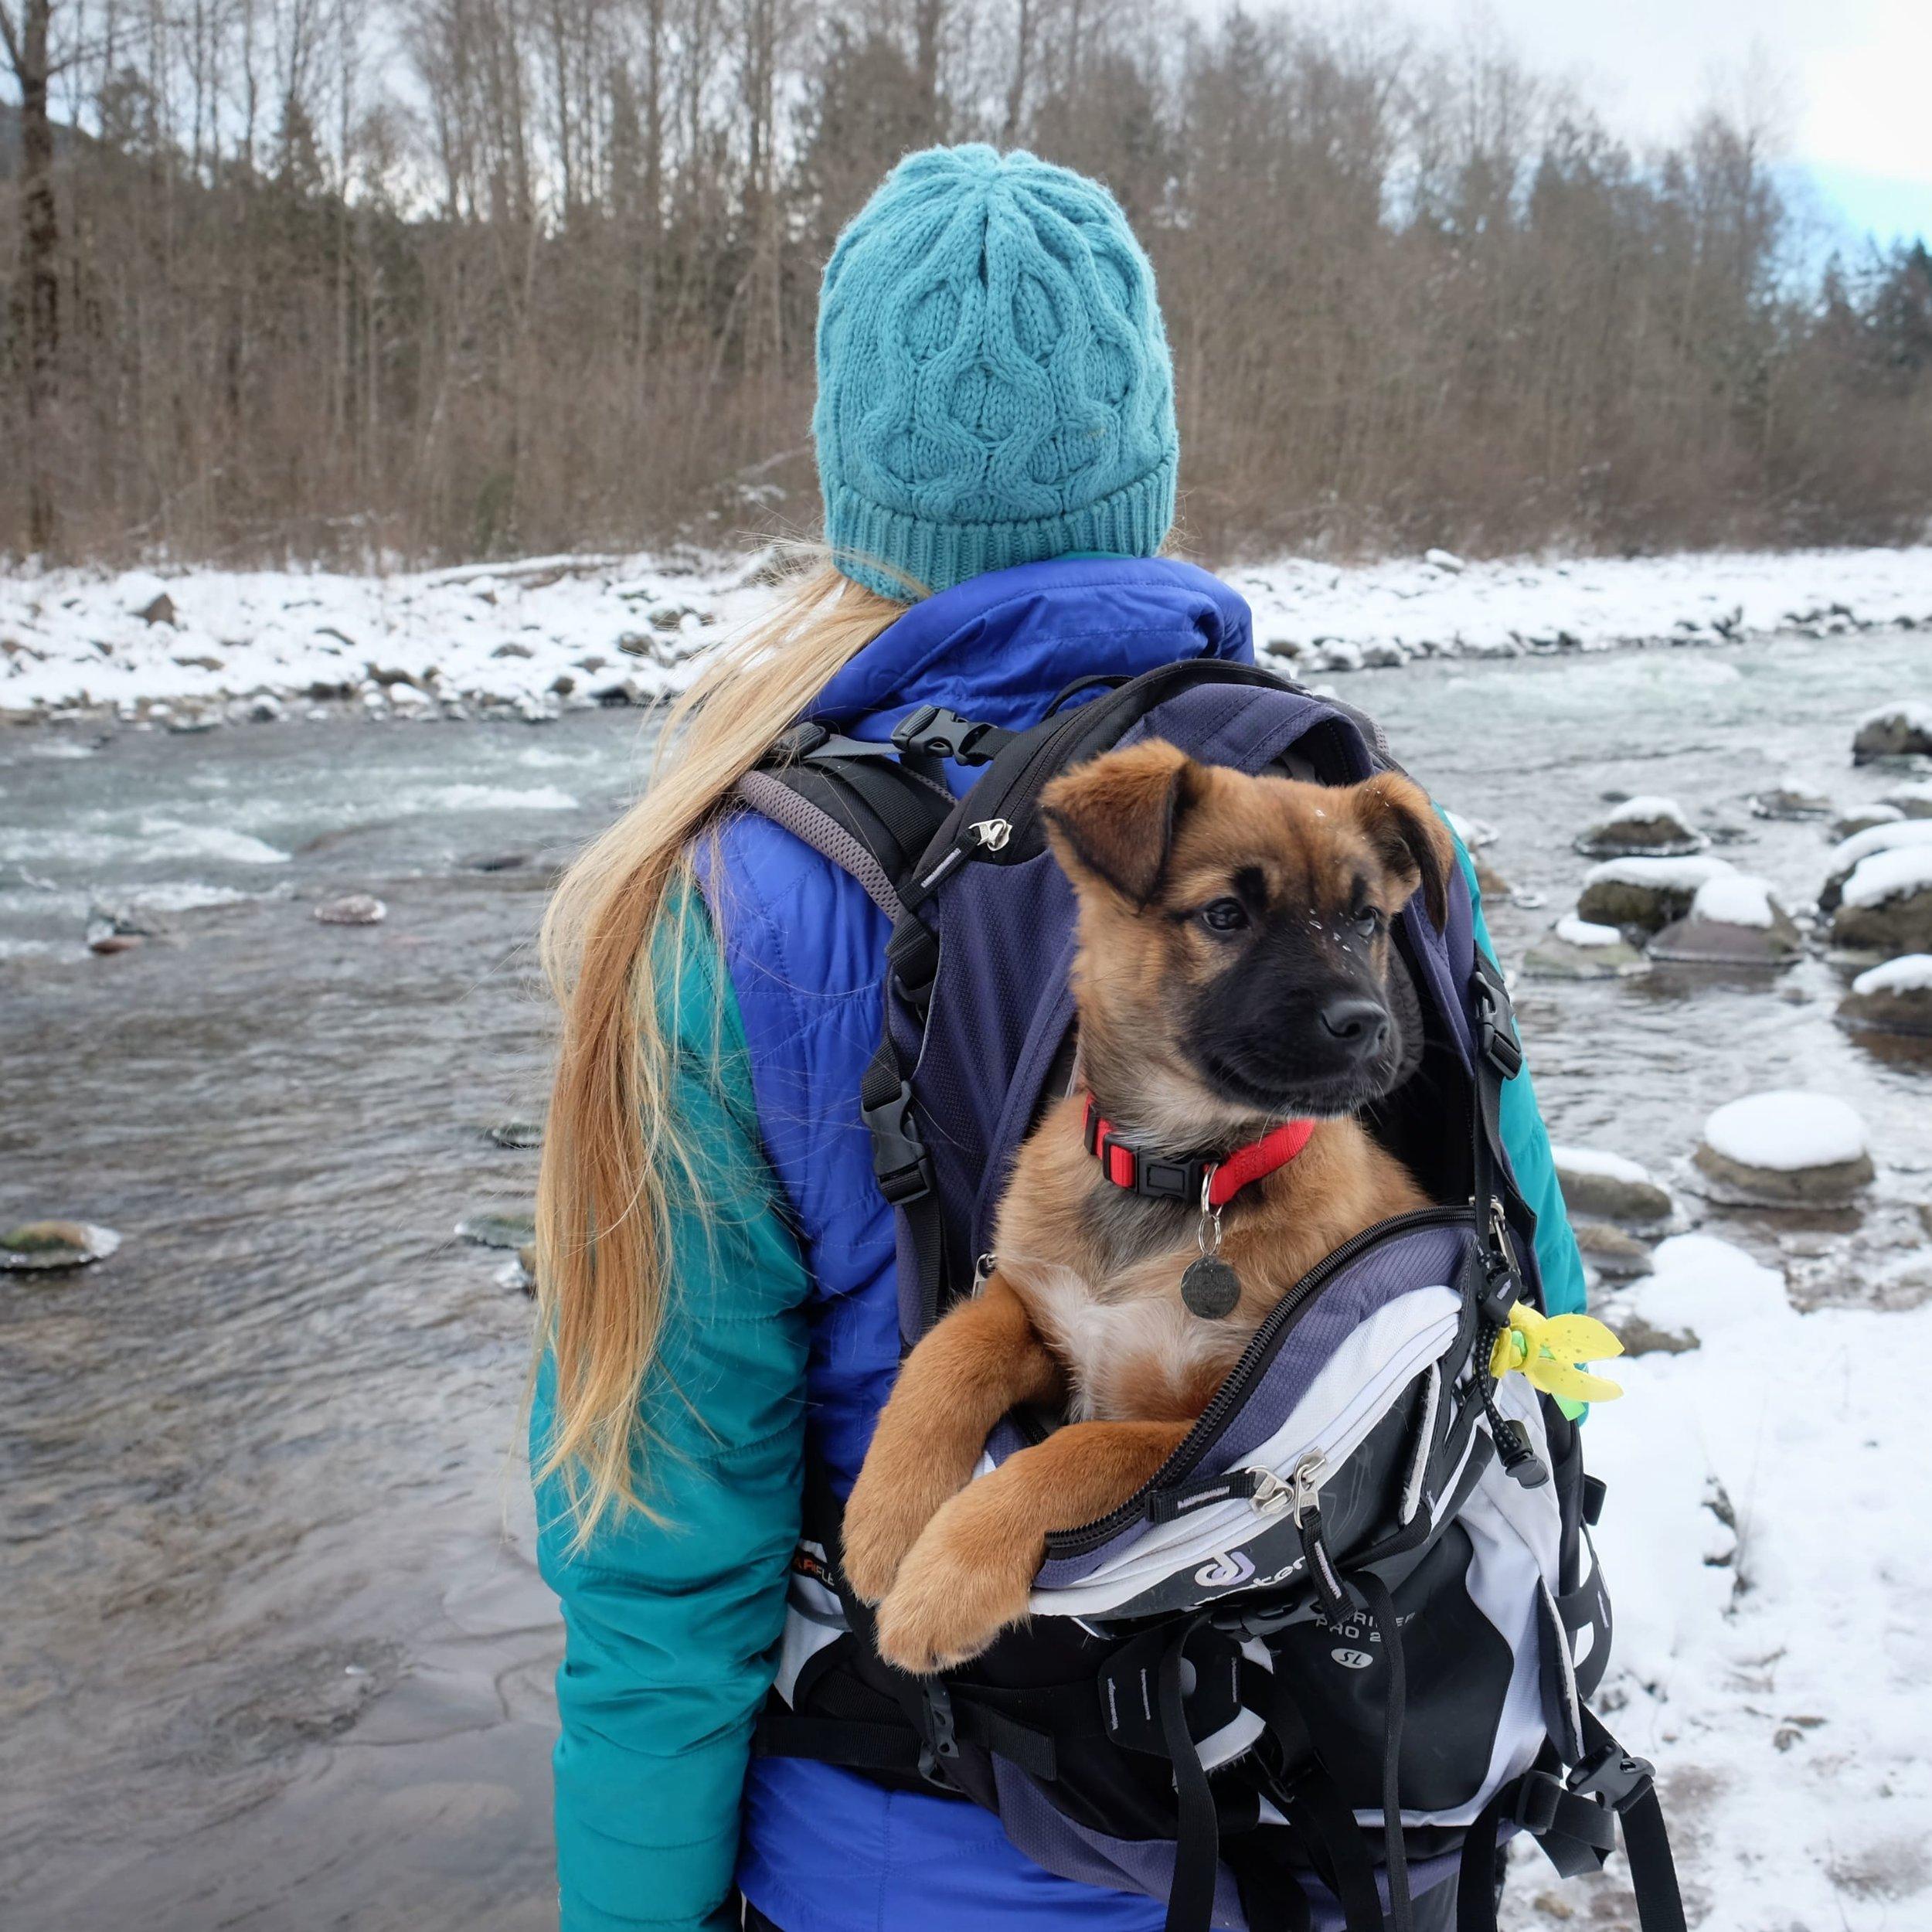 Becca.Tarbox.DogPackrafting2-min.jpg